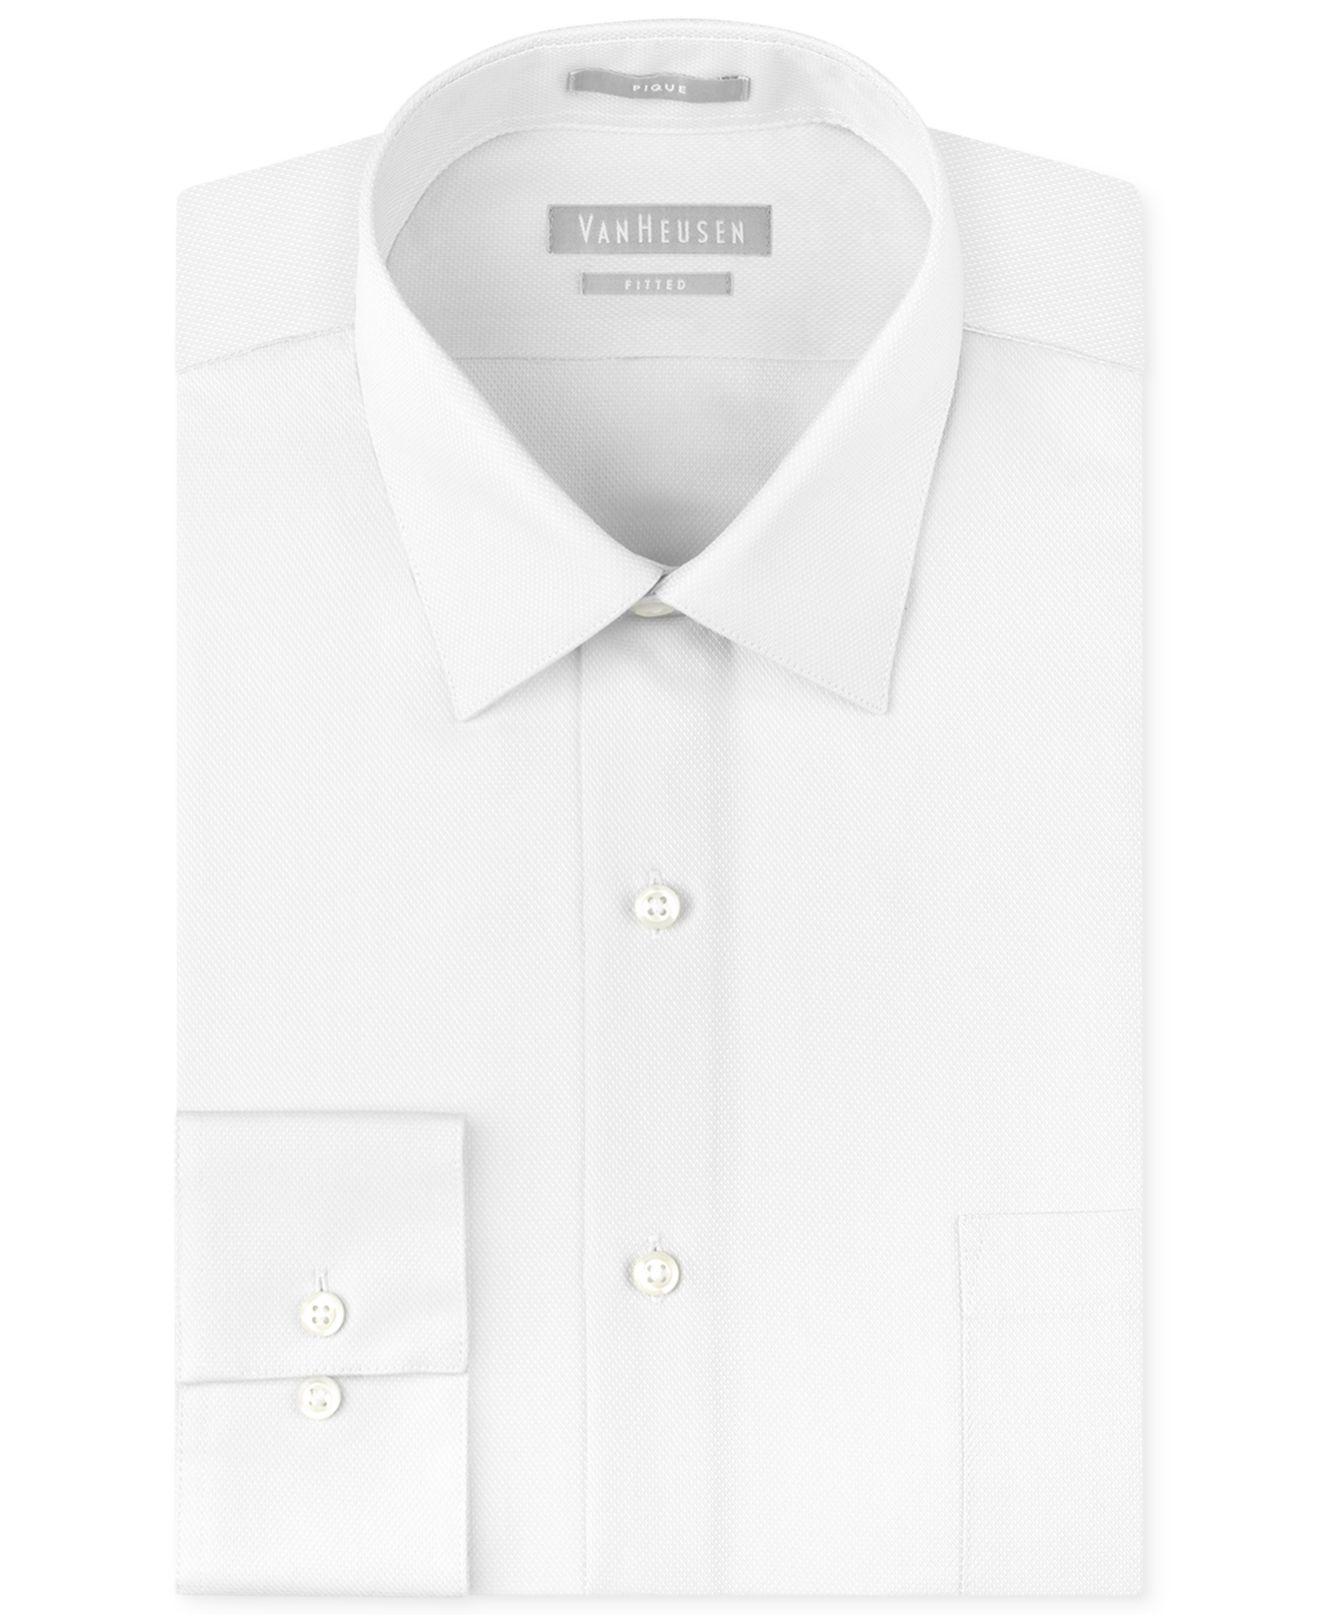 Van heusen men 39 s fitted non iron pique dress shirt in for Van heusen iron free shirts